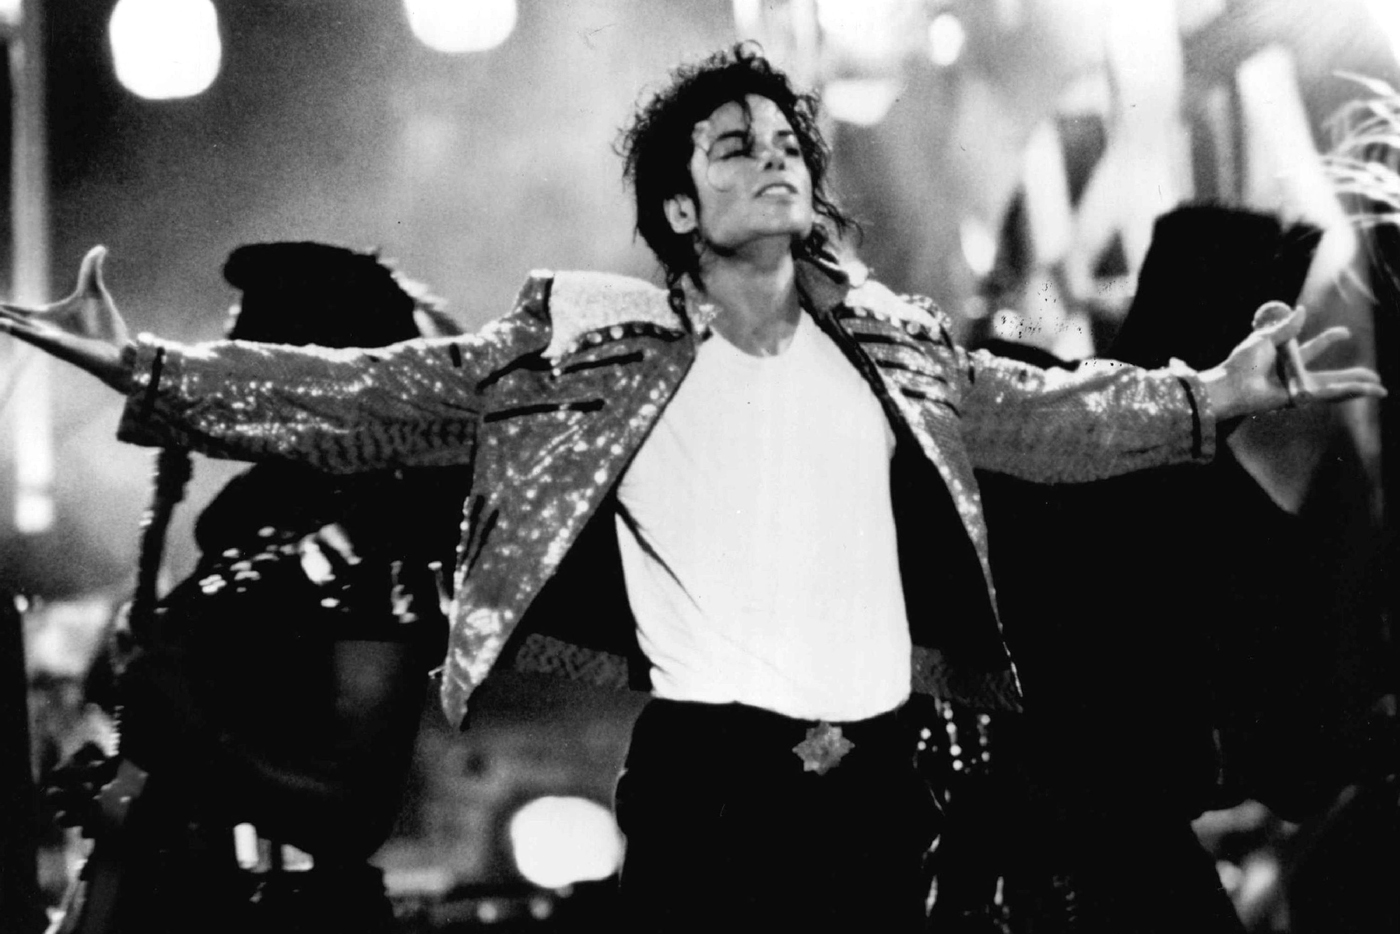 Michael Jackson 26 Widescreen Wallpaper